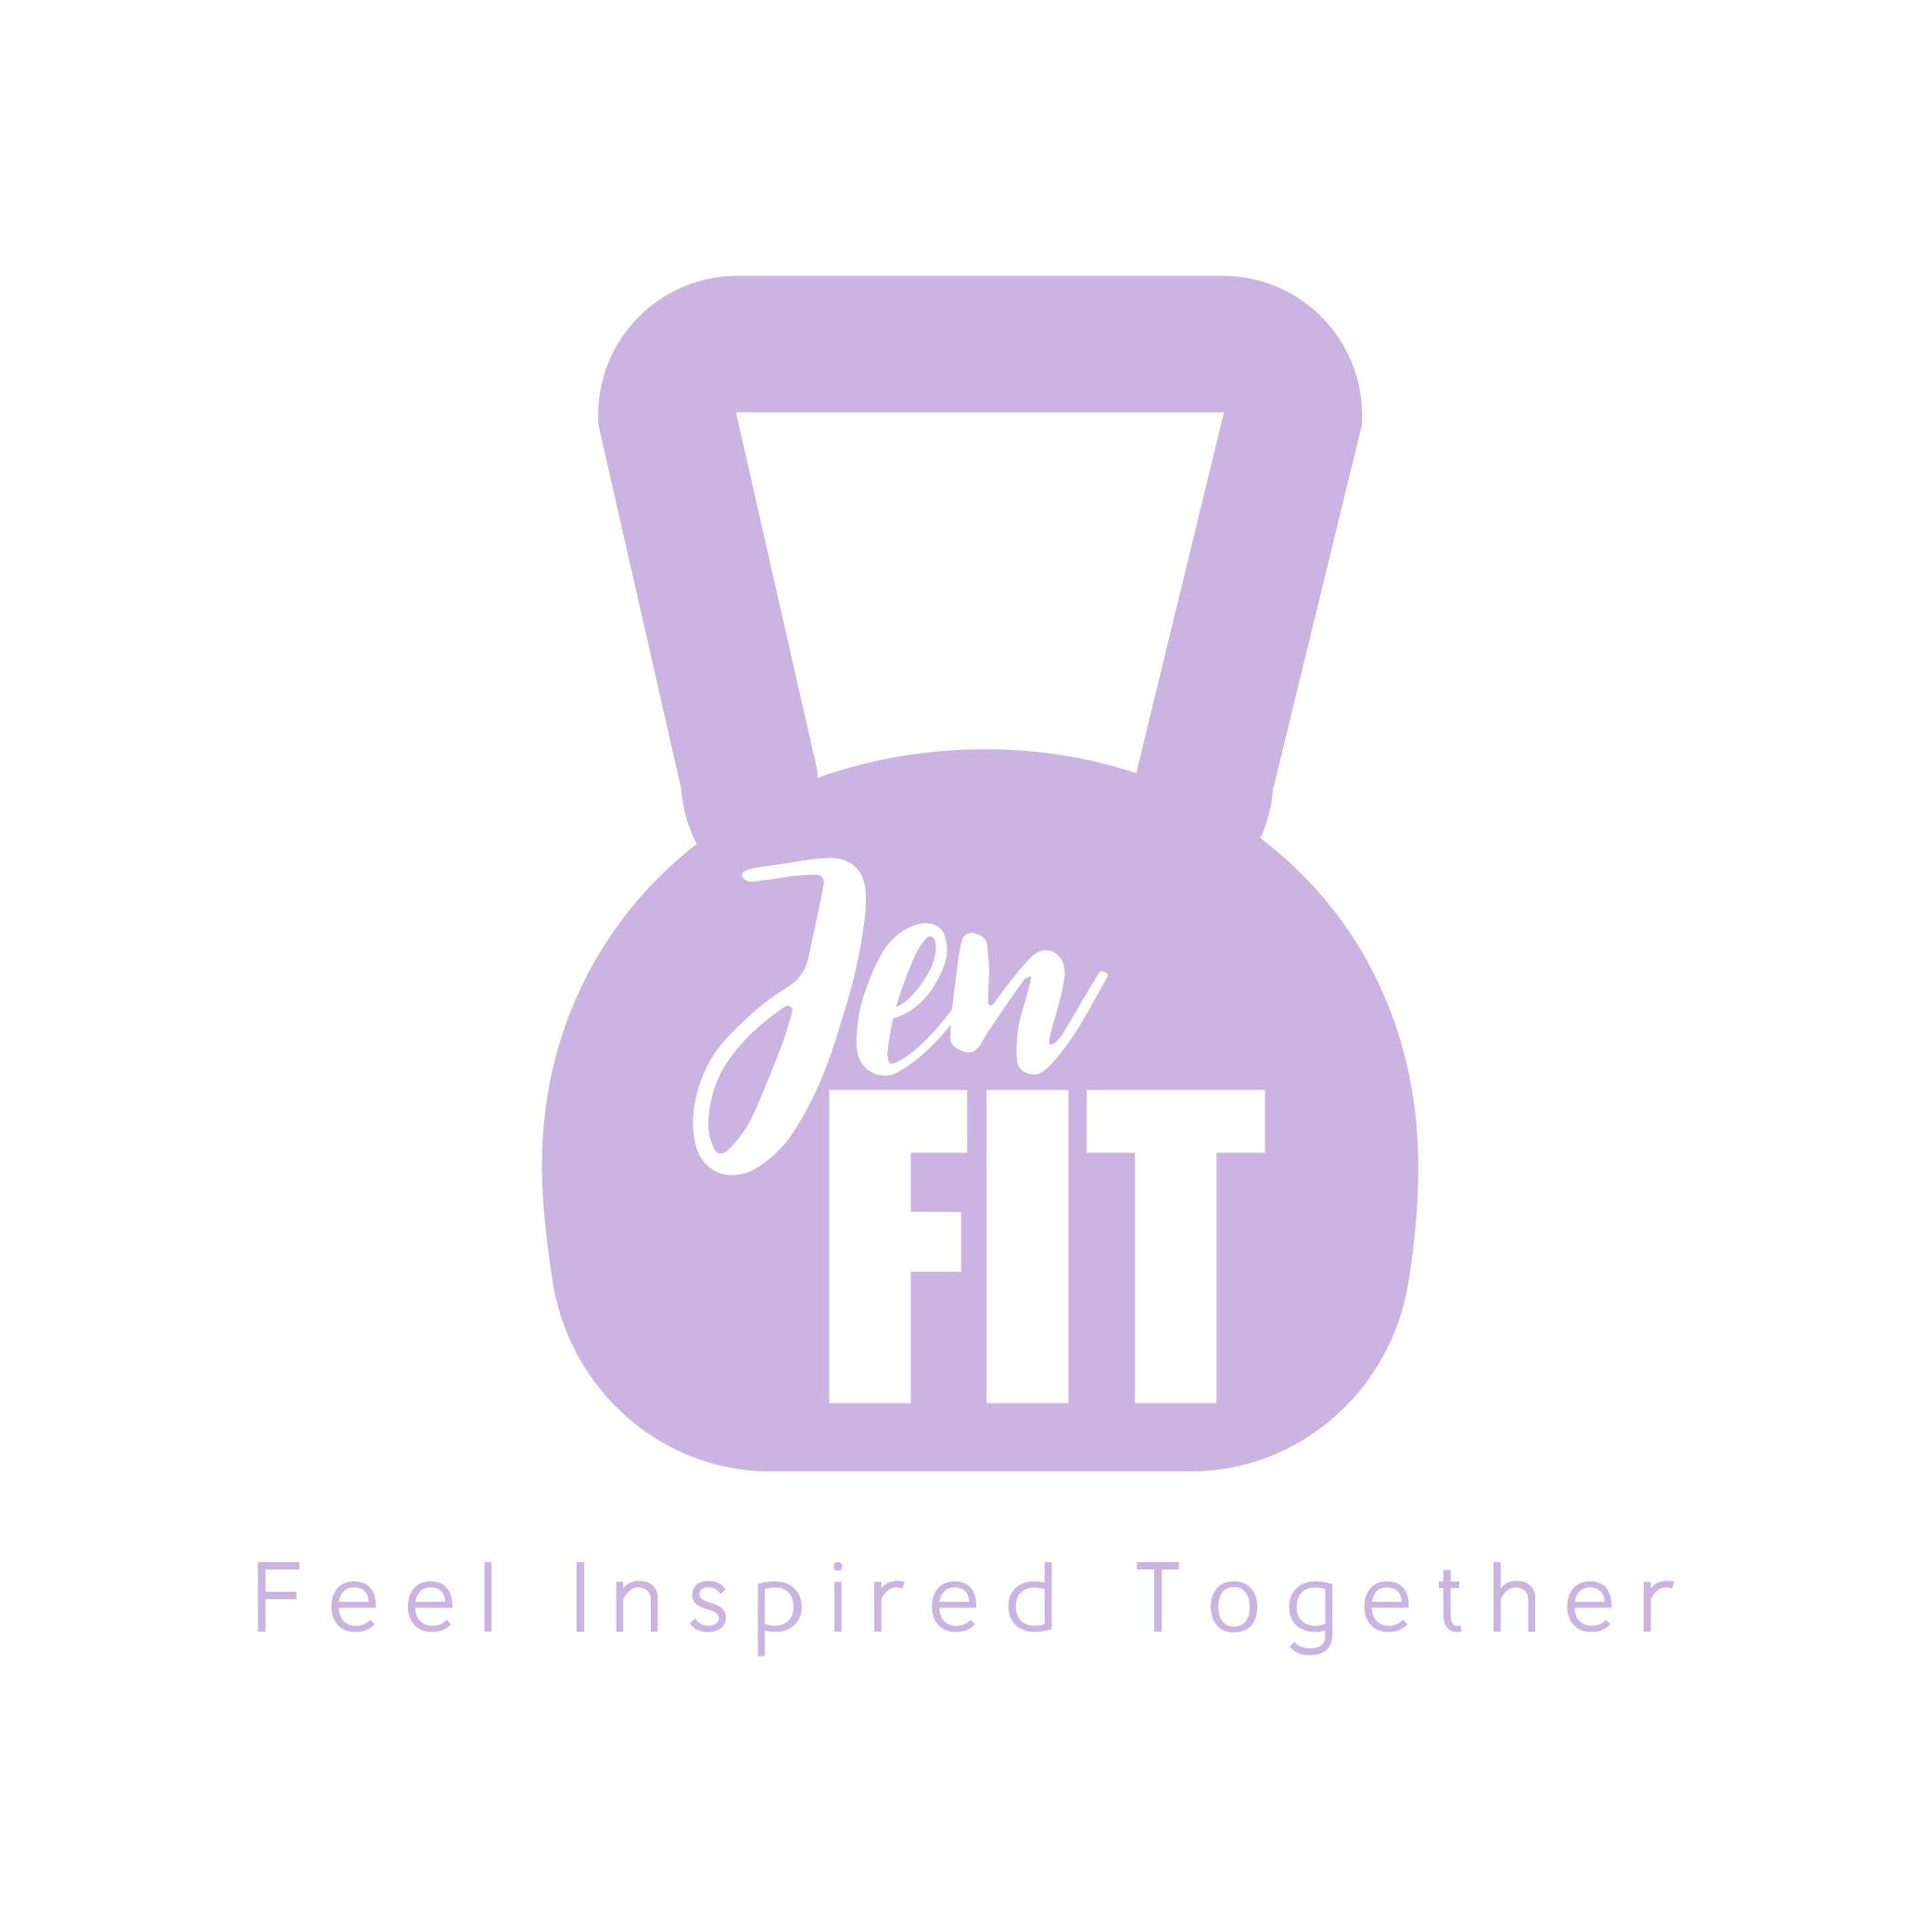 JenFit - Jennifer McLoughlin Fitness, PT and Yoga